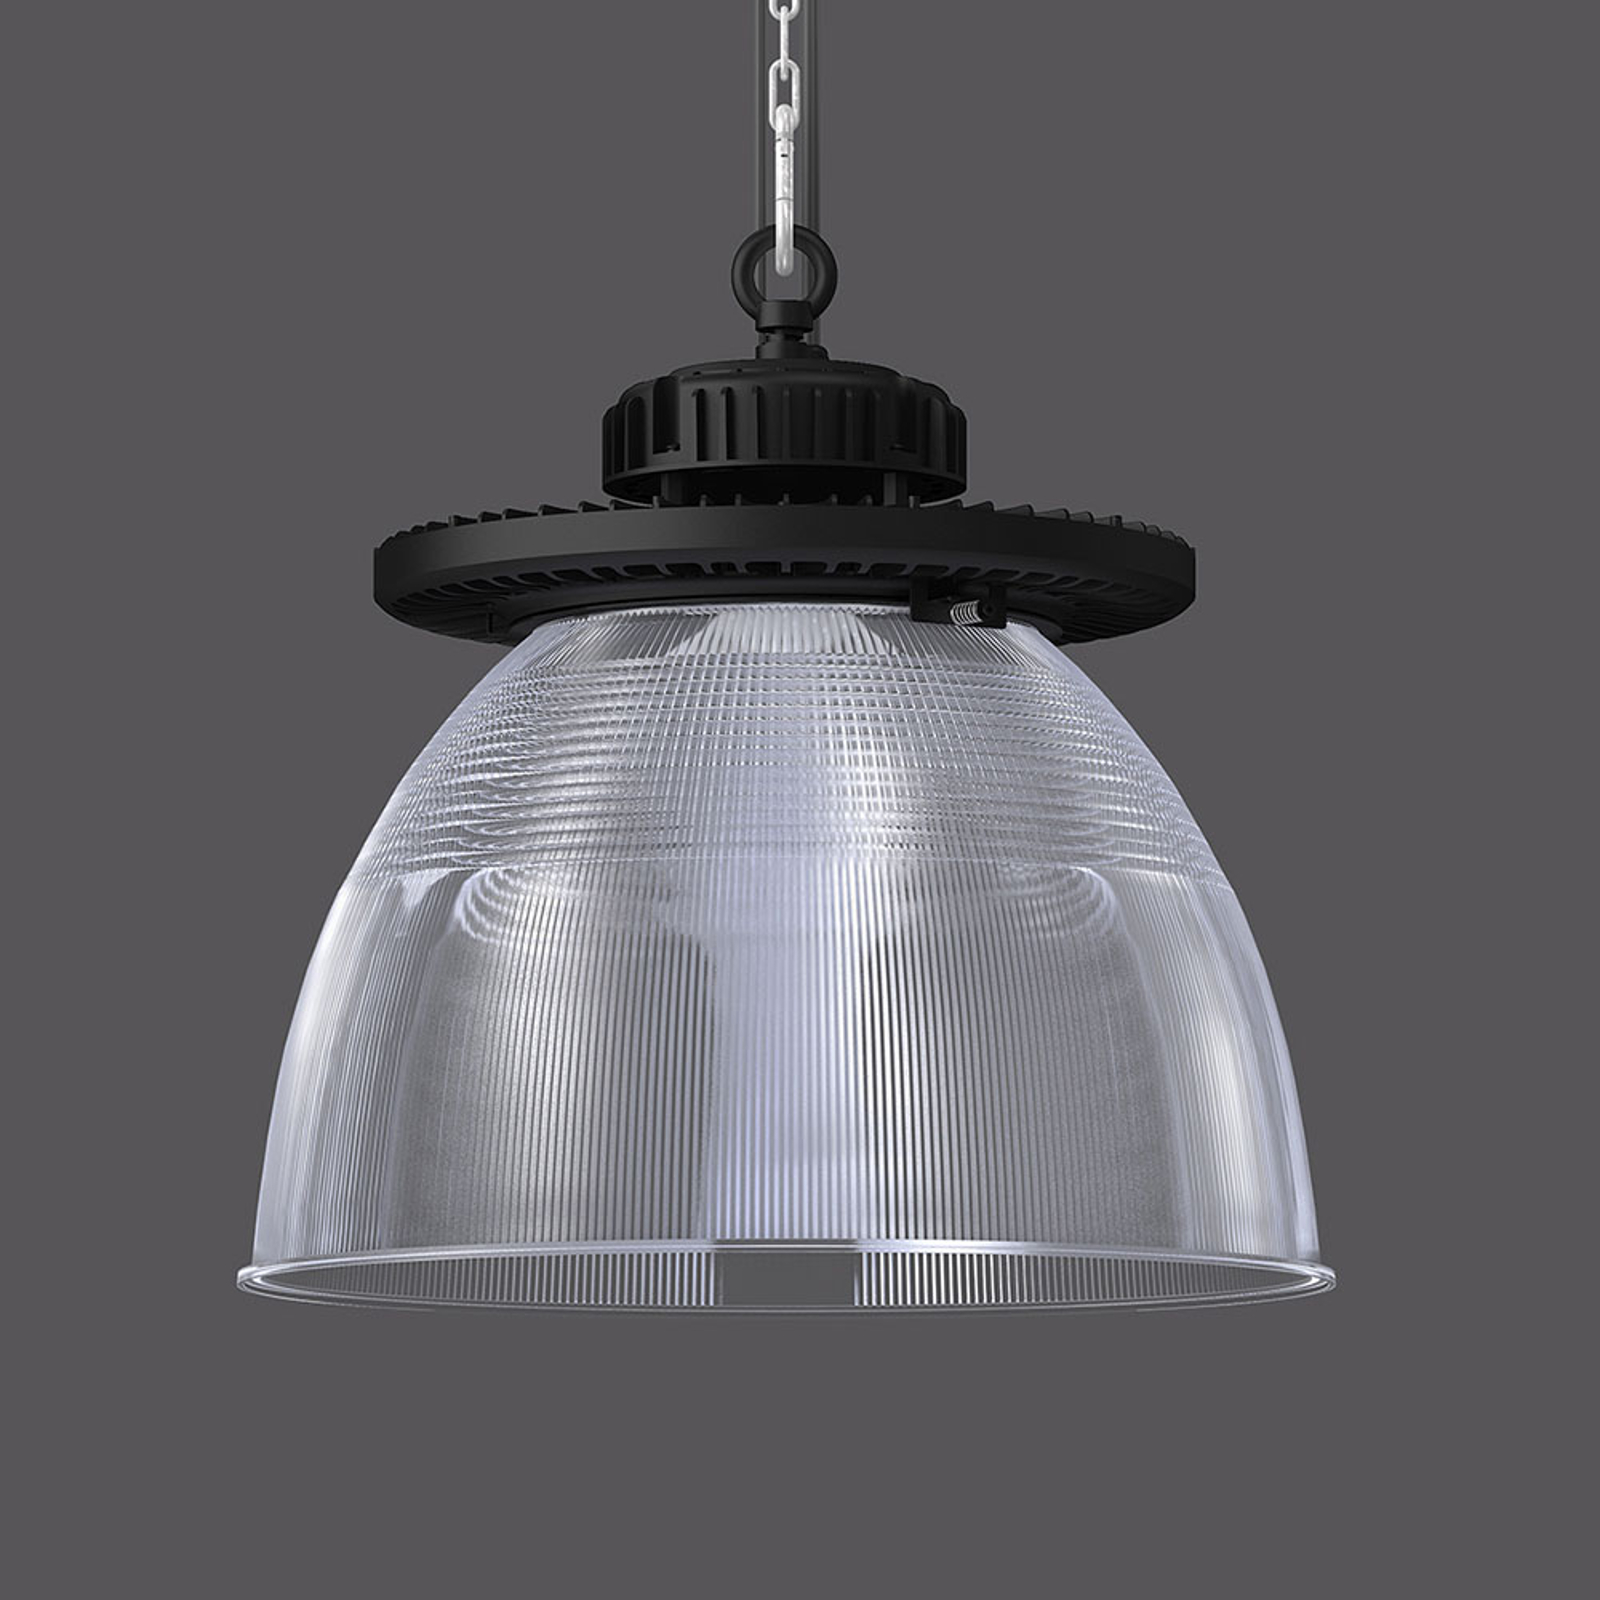 RZB Industrial Hall Maxi DALI 251 W refraktor PMMA